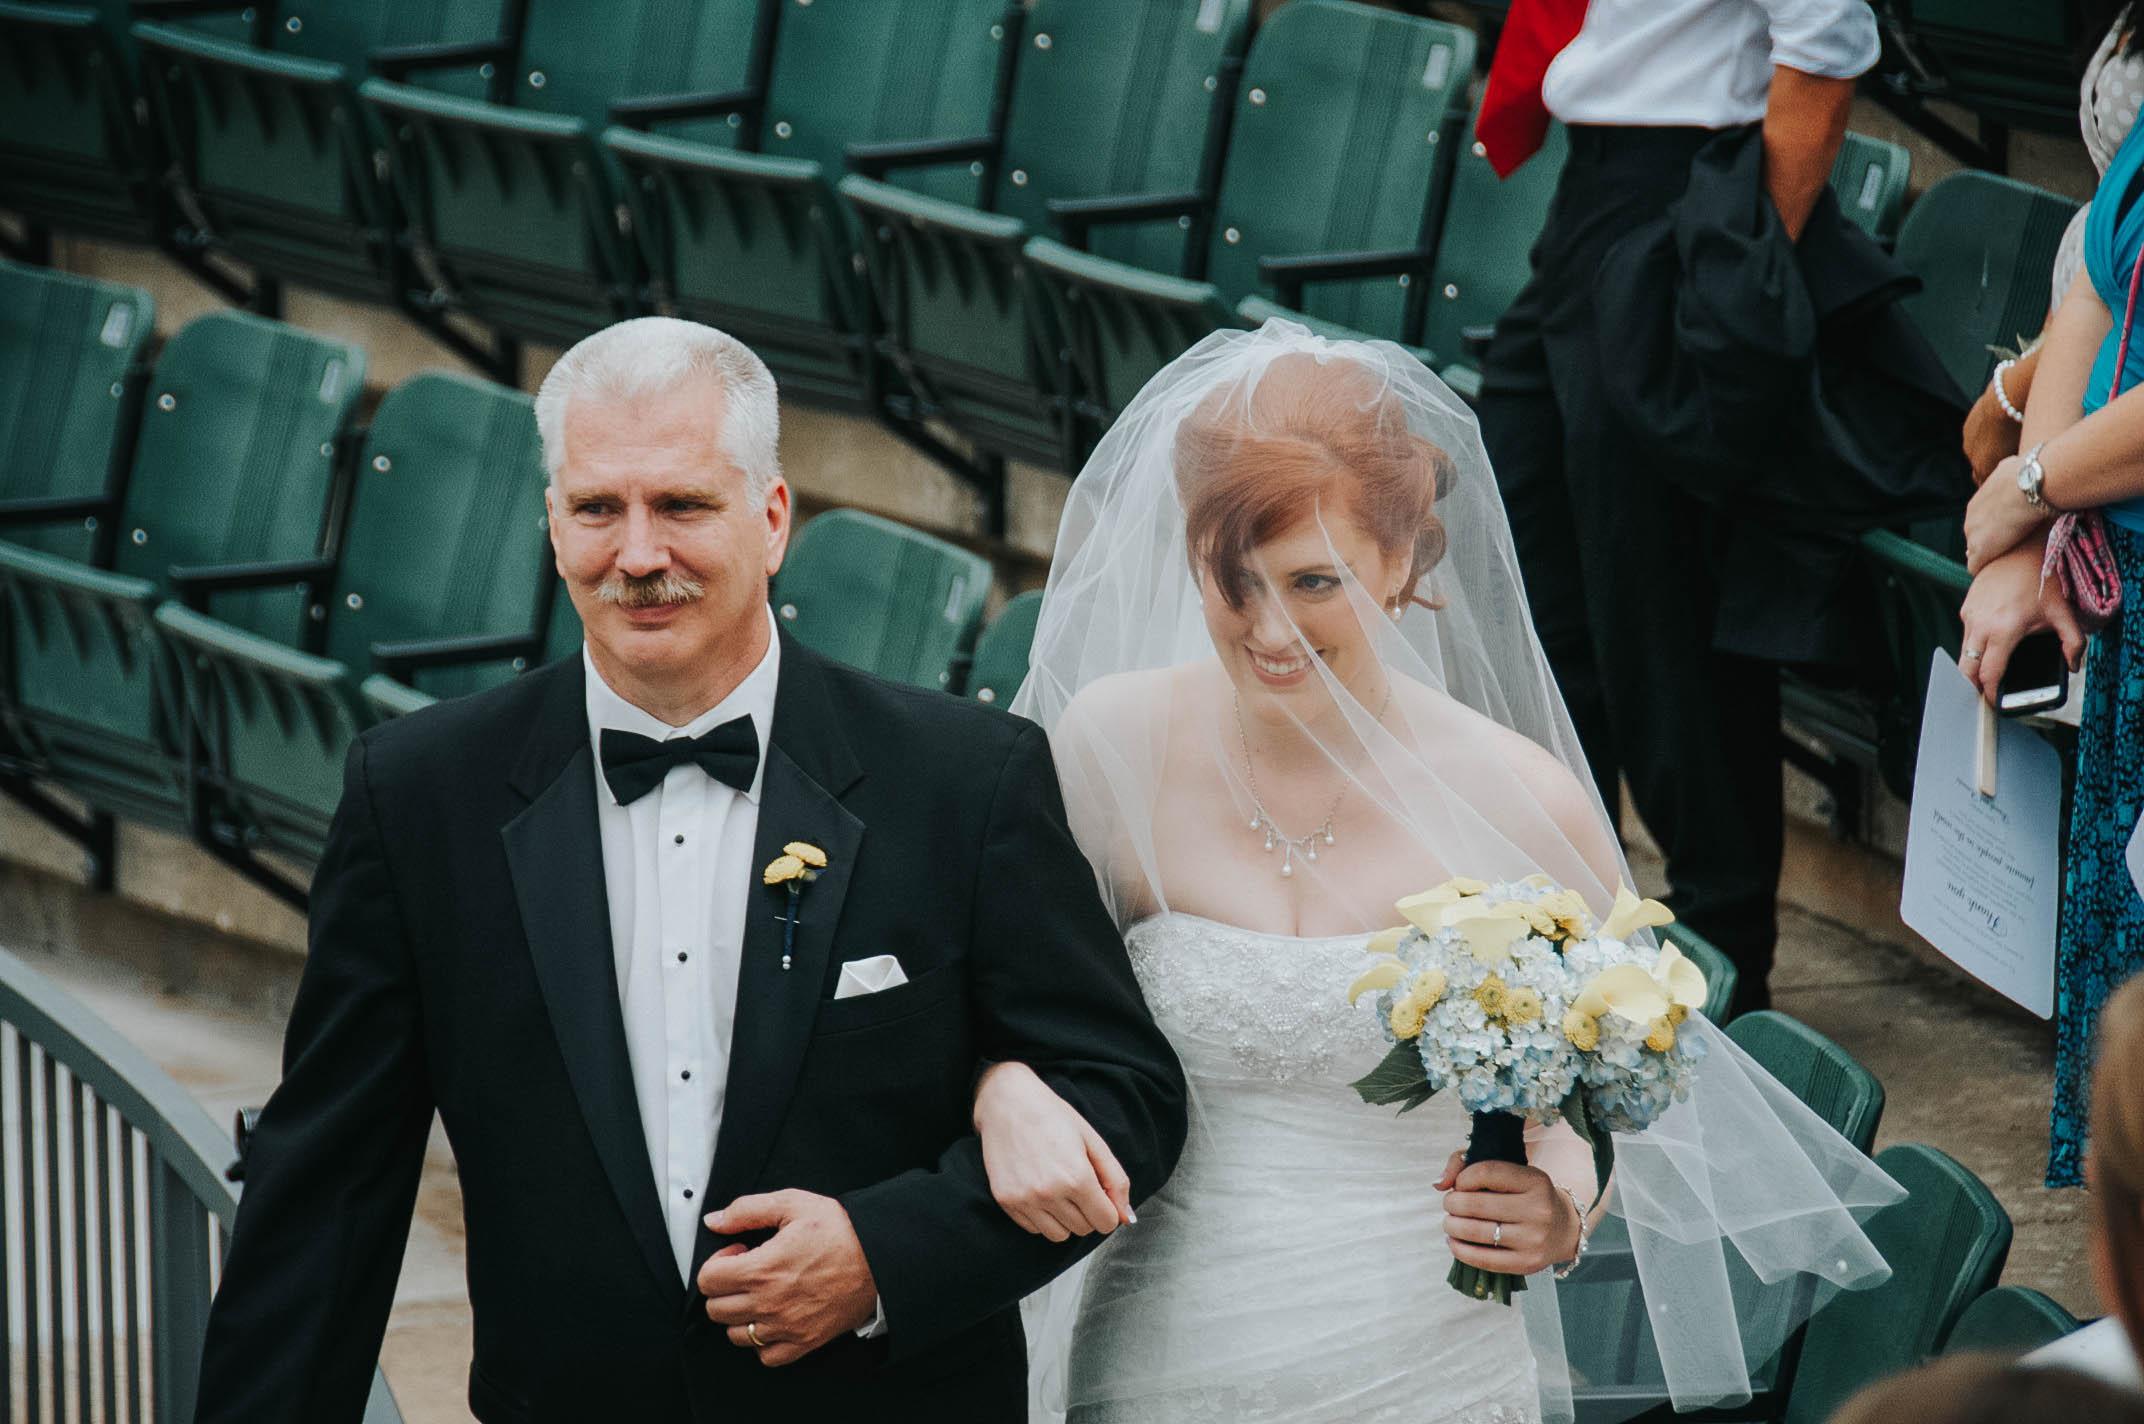 Whidbey-Island-Wedding-Photographer-J-Hodges (3 of 23).jpg